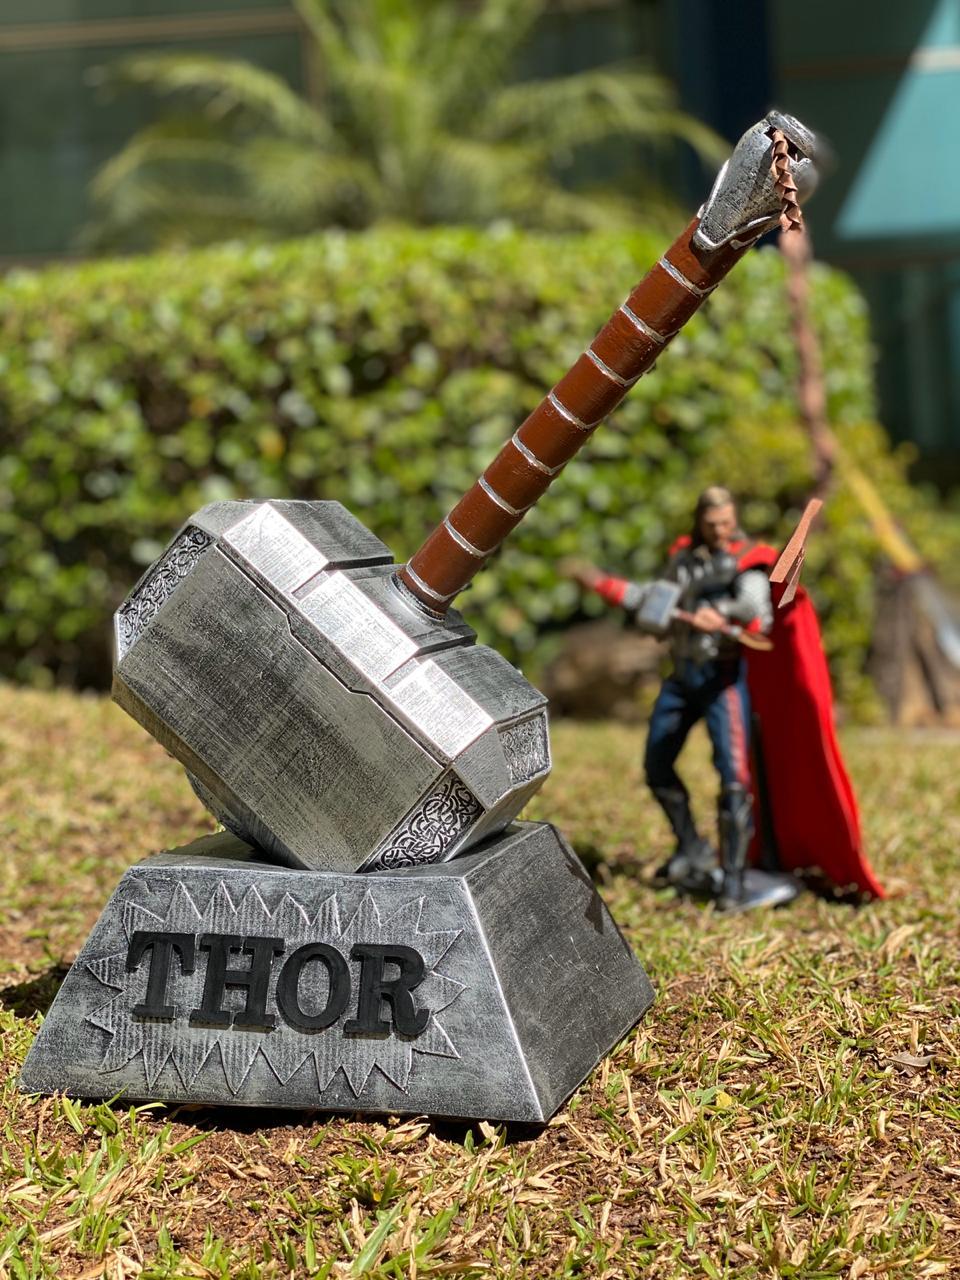 Réplica Martelo Thor - Com base:  (Mjölnir): Marvel